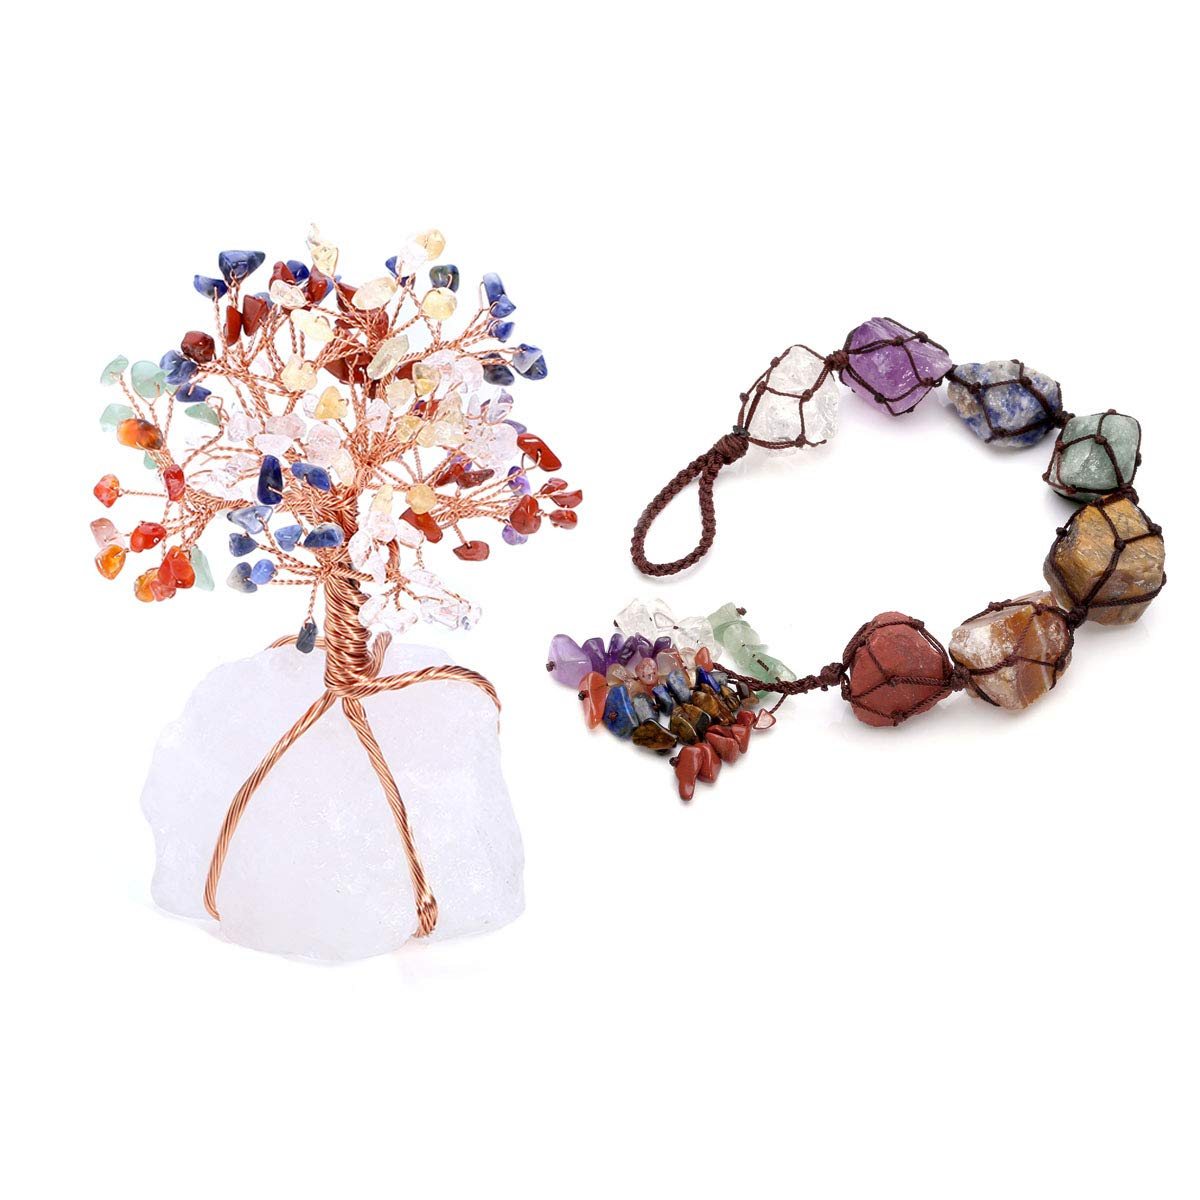 CrystalTears 7 Chakra Tree Life Crystal Kit Reiki Fengshui Gemstone Hanging Ornament Home Indoor Decoration Healing,Wealth,Luck,Yoga Meditation,Protection